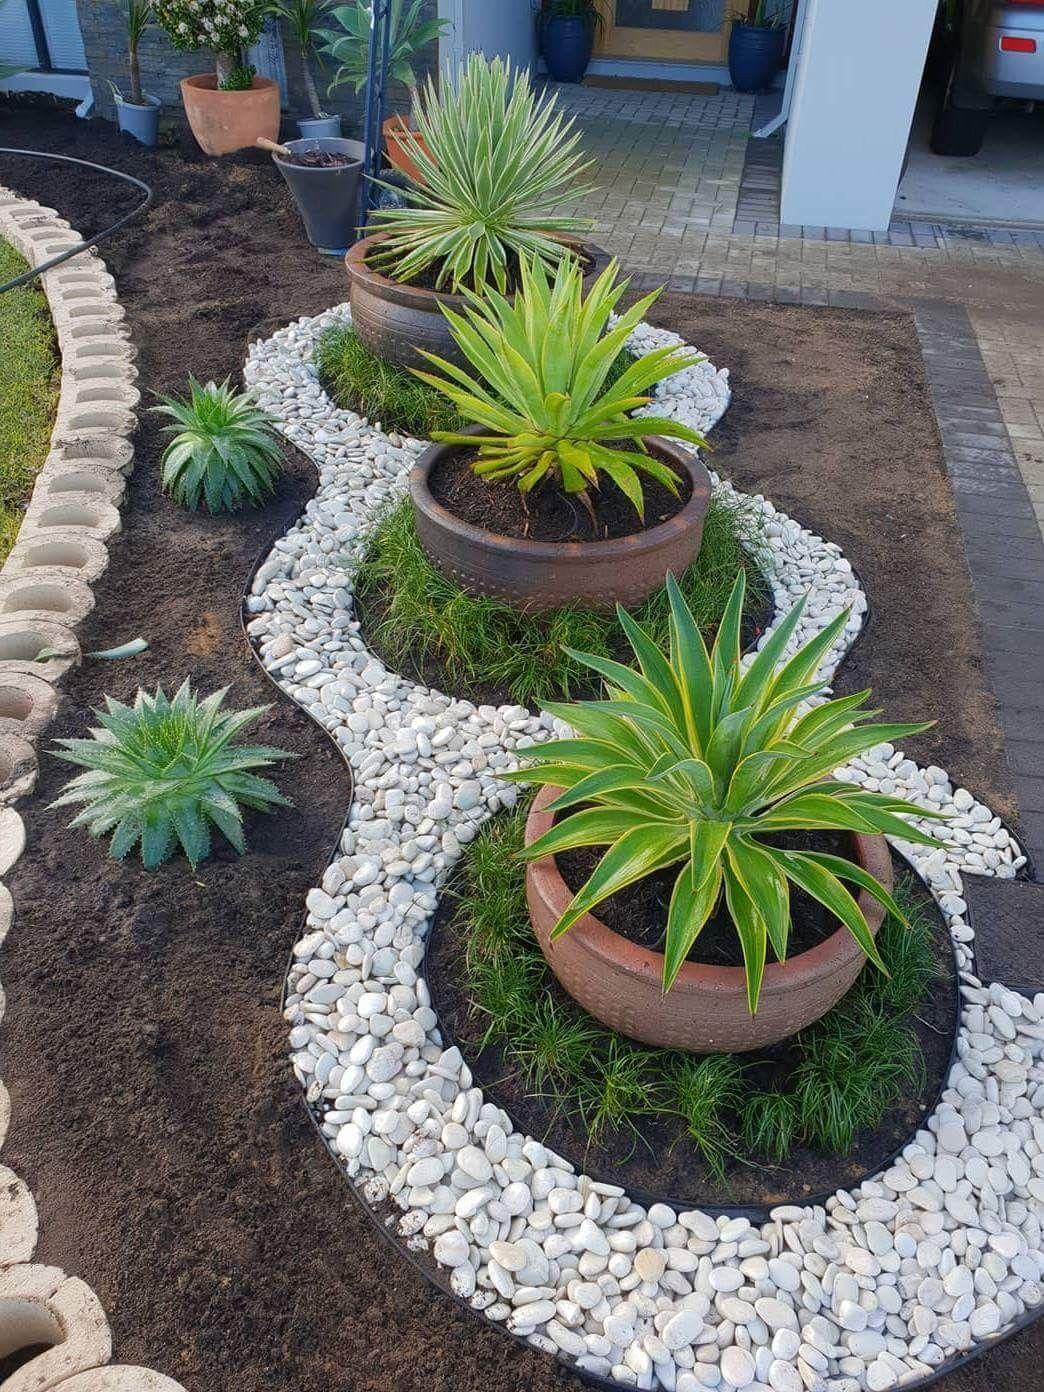 46 Funky Garden Dividers Gardentine Com Ide Berkebun Kebun Kecil Desain Kebun Modern Backyard garden designs pinterest